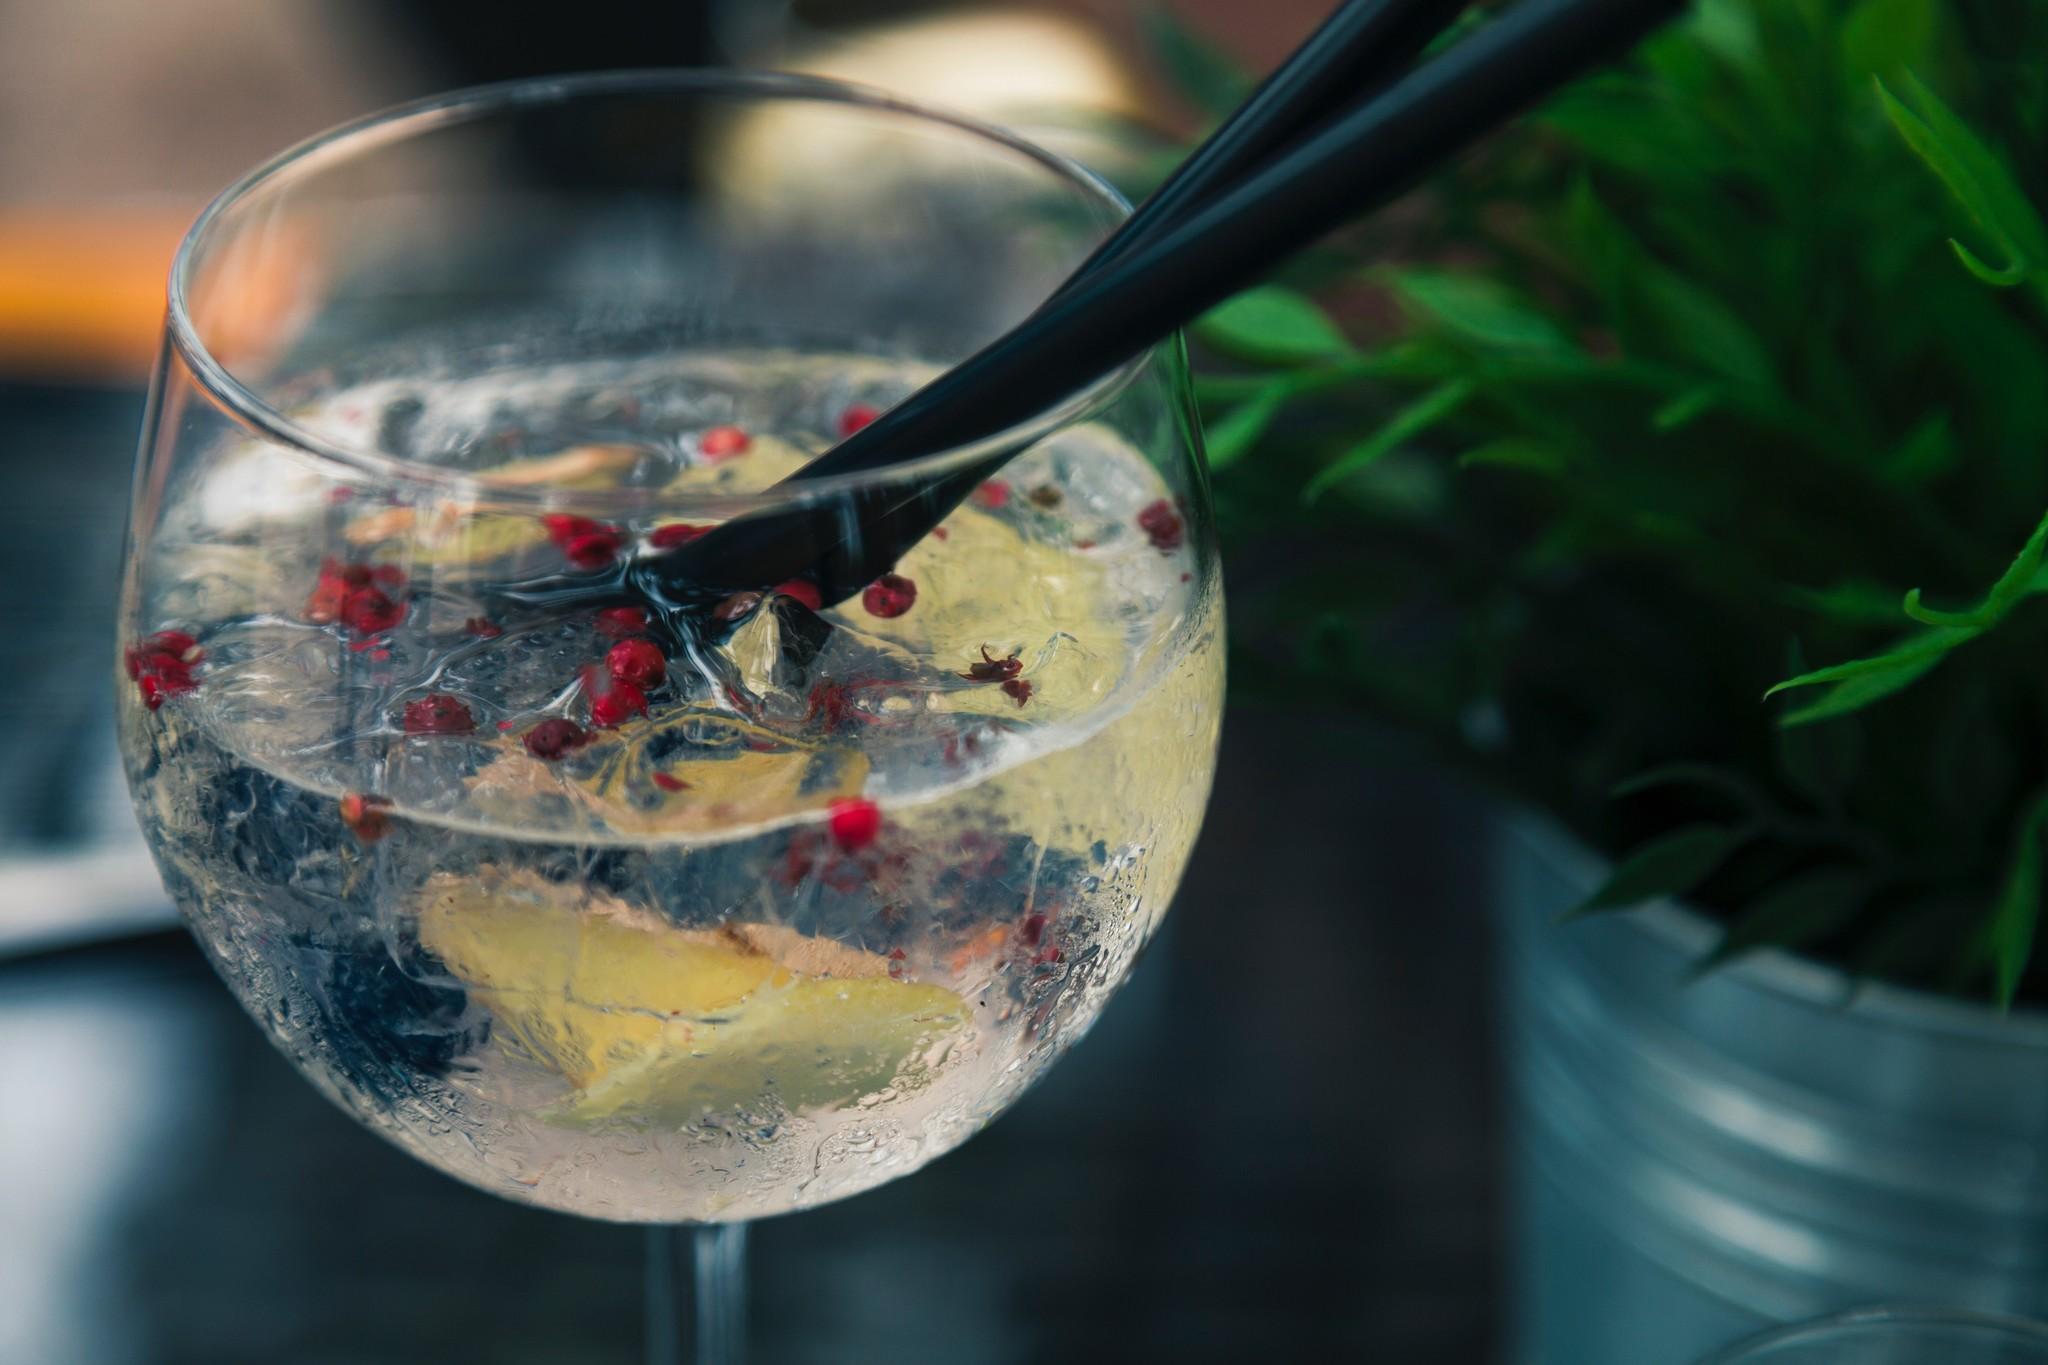 Gin Tonic pakket kopen? Wij zetten de mooiste Gin Tonic cadeausets op een rijtje